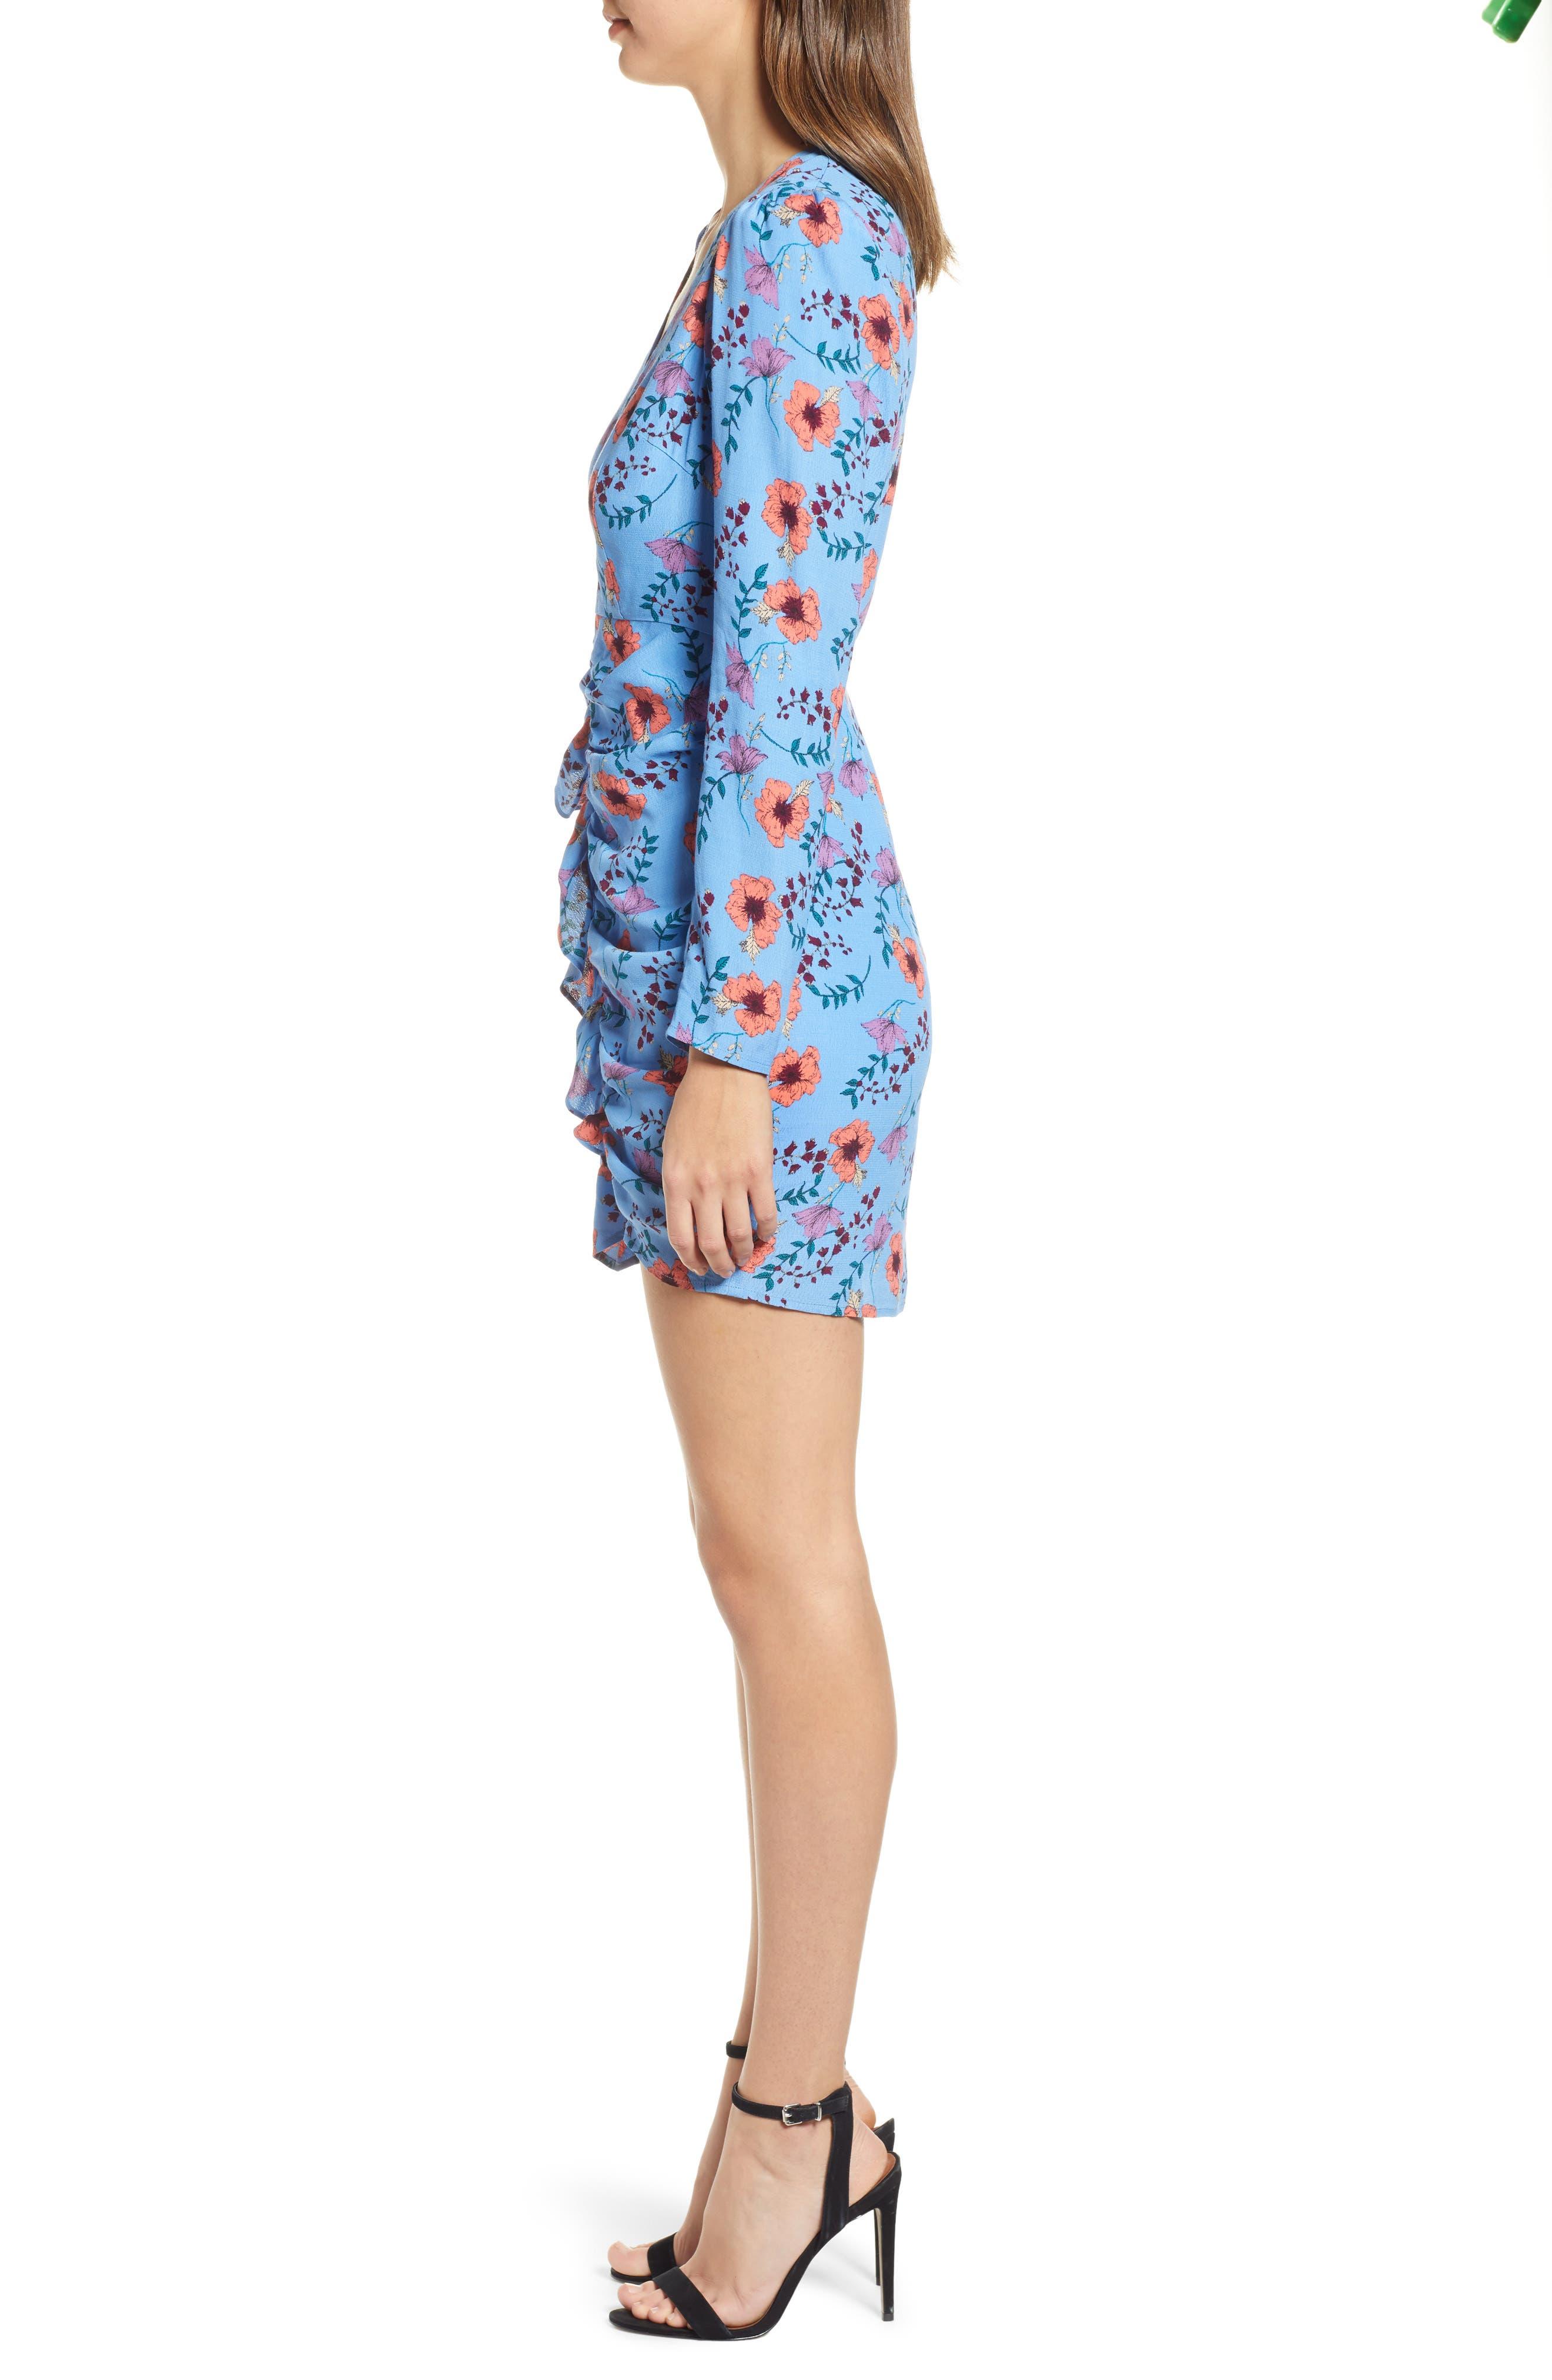 ASTR THE LABEL, Floral Print Ruched Dress, Alternate thumbnail 4, color, BLUE MULTI FLORAL